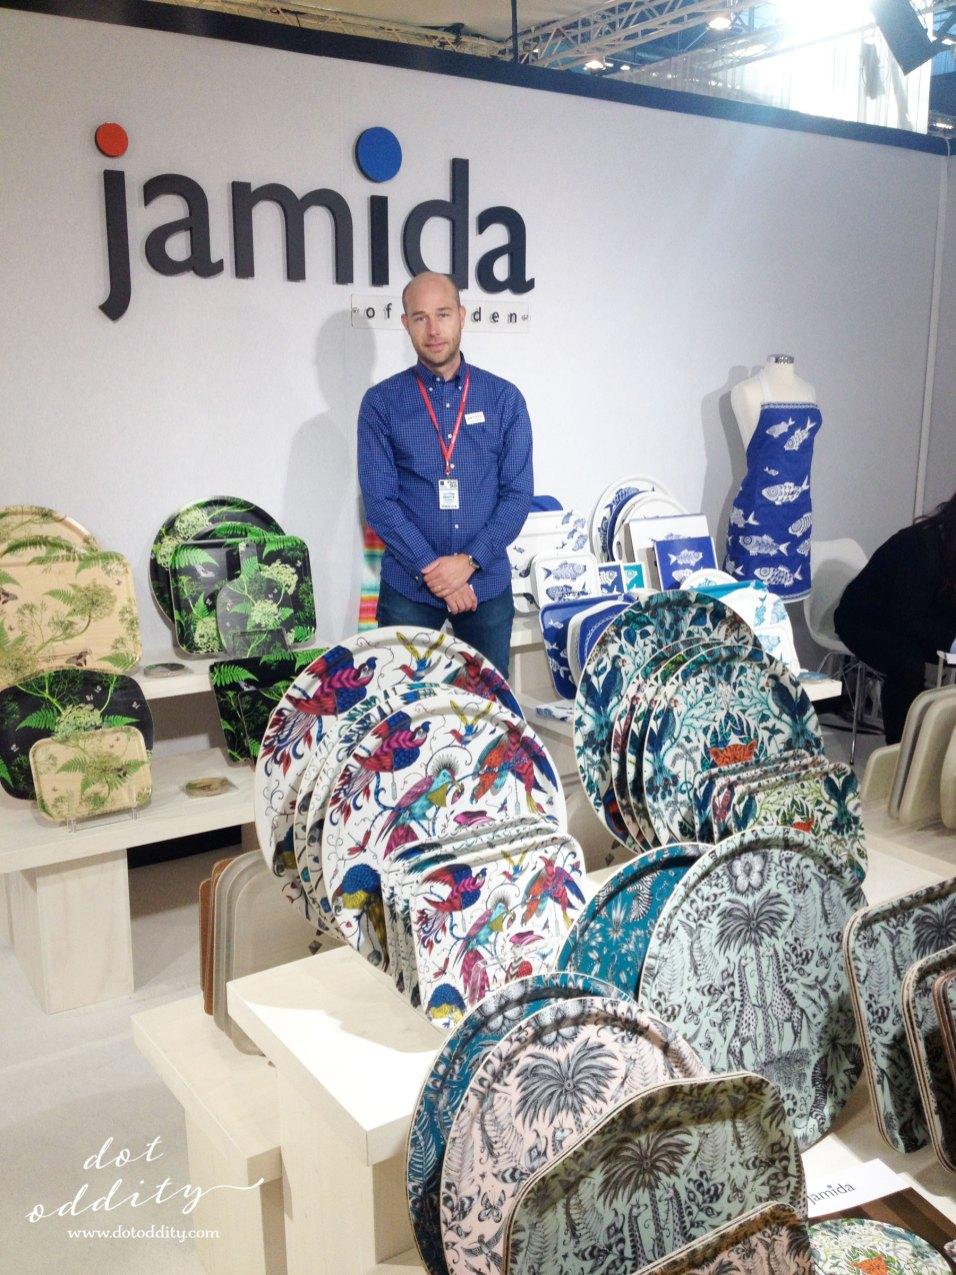 Jamida of Sweden